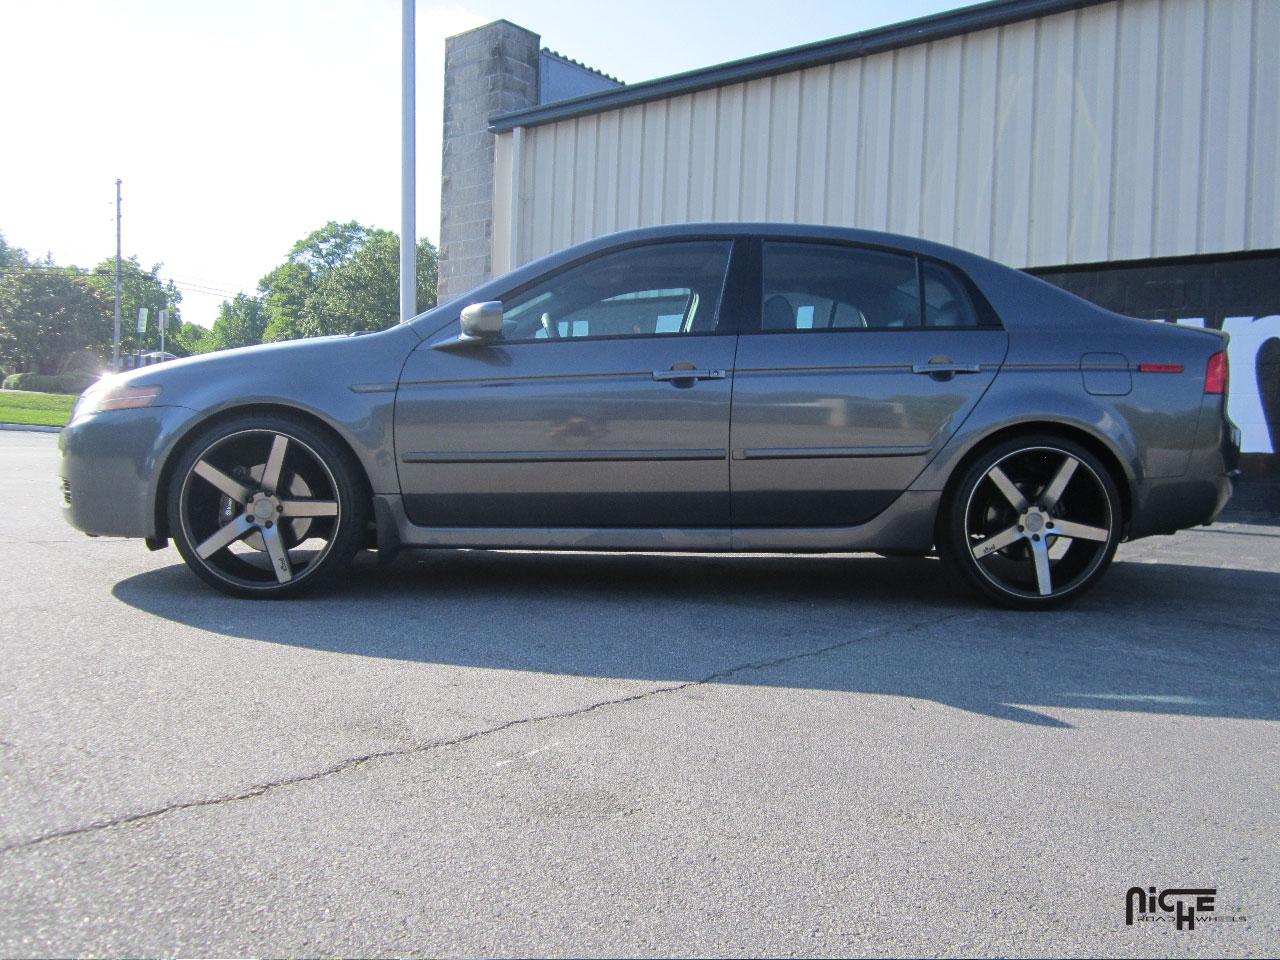 Gallery Niche Wheels - Acura tl rim